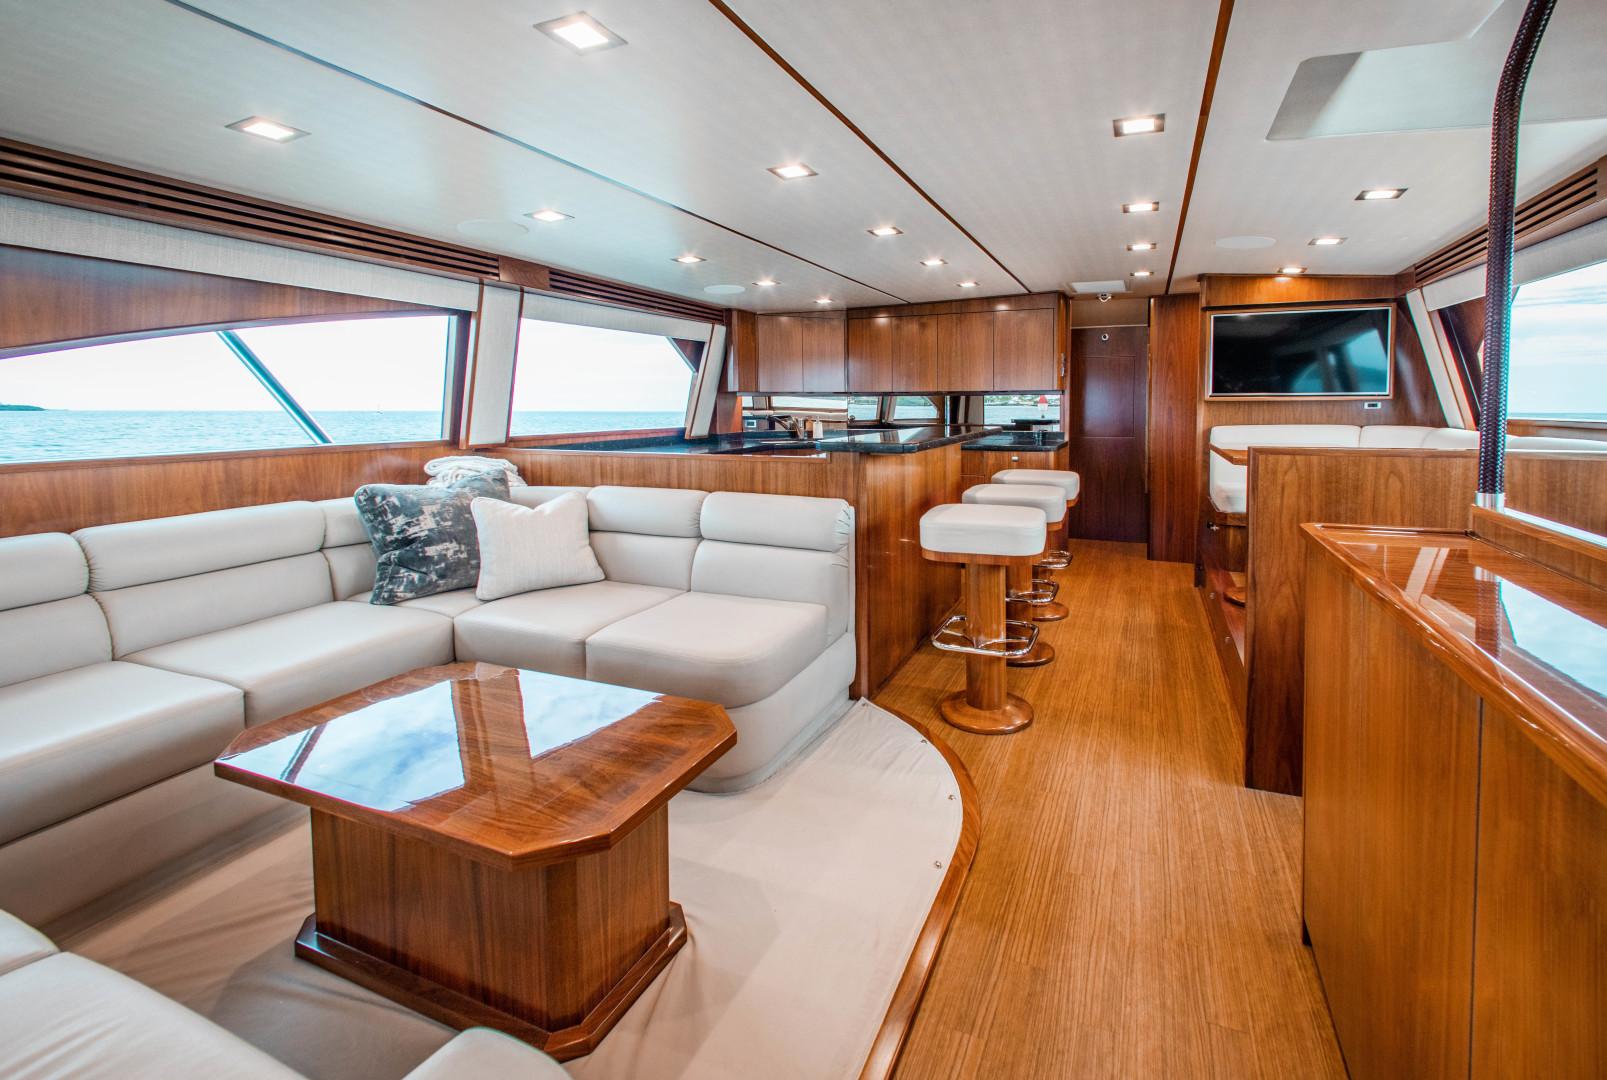 Viking-72 Enclosed Bridge 2018-Red Lion Ocean Reef-Florida-United States-2018 Viking 72 Enclosed Bridge  Red Lion  Salon-1568238   Thumbnail